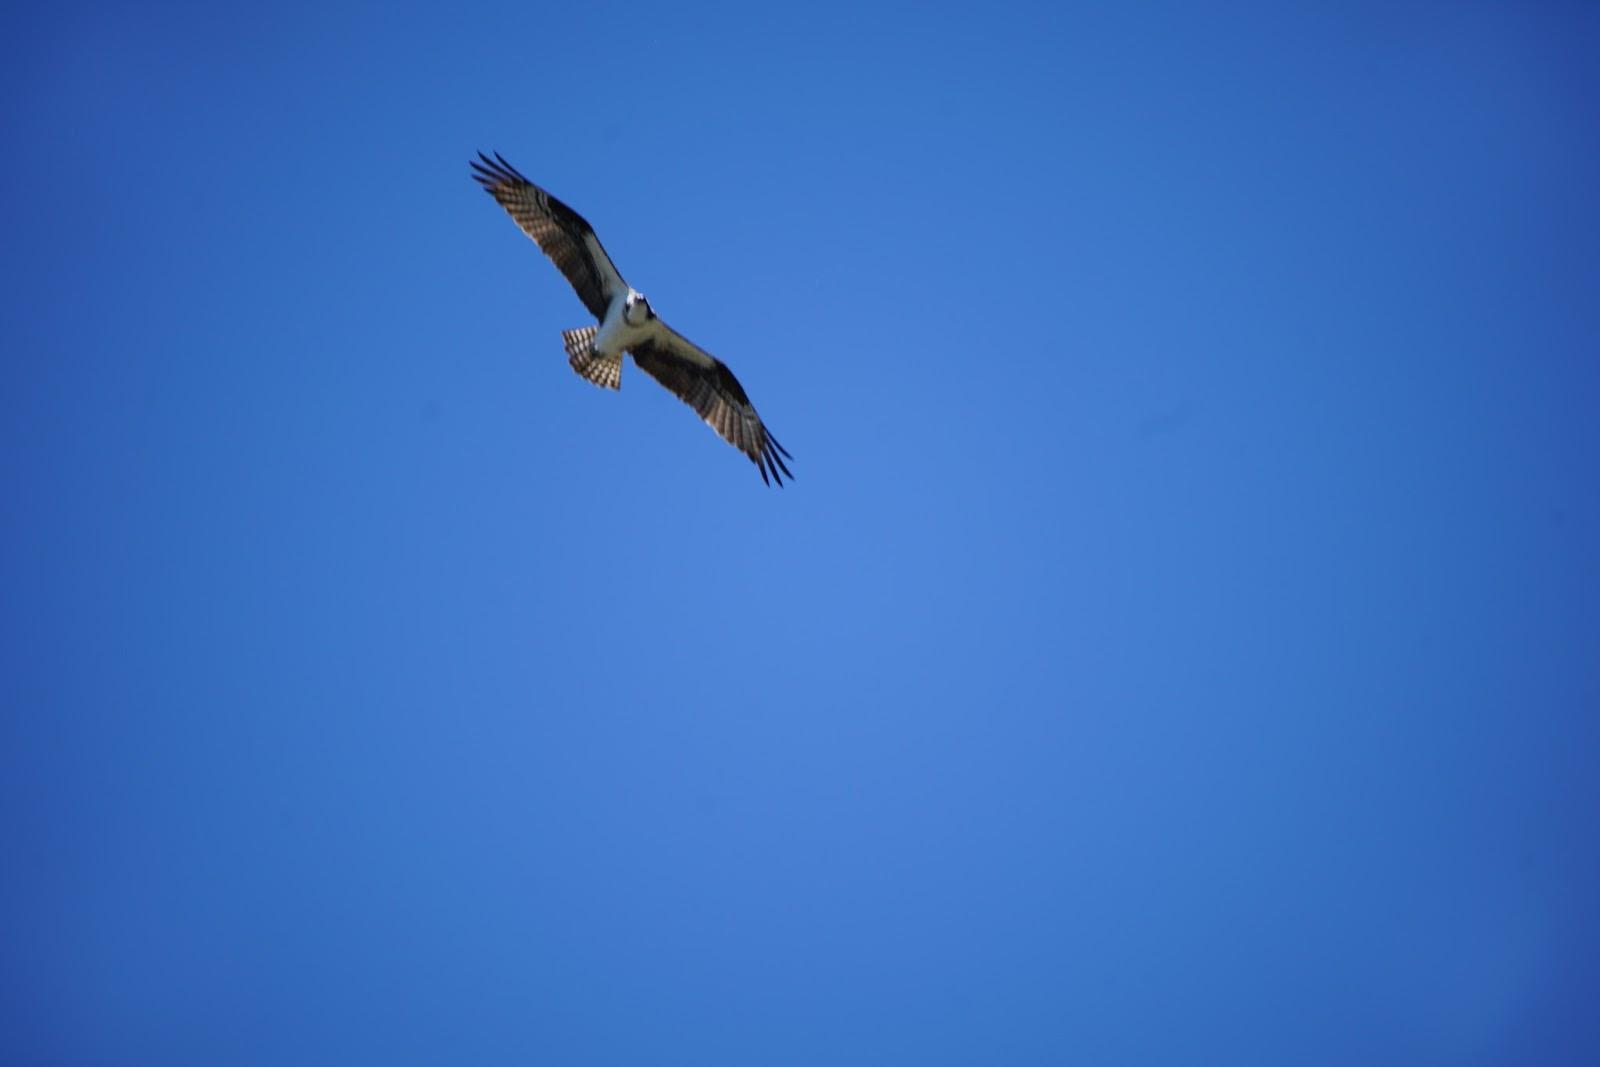 Mid Sierra Musings Balsam Forebay Ospreys